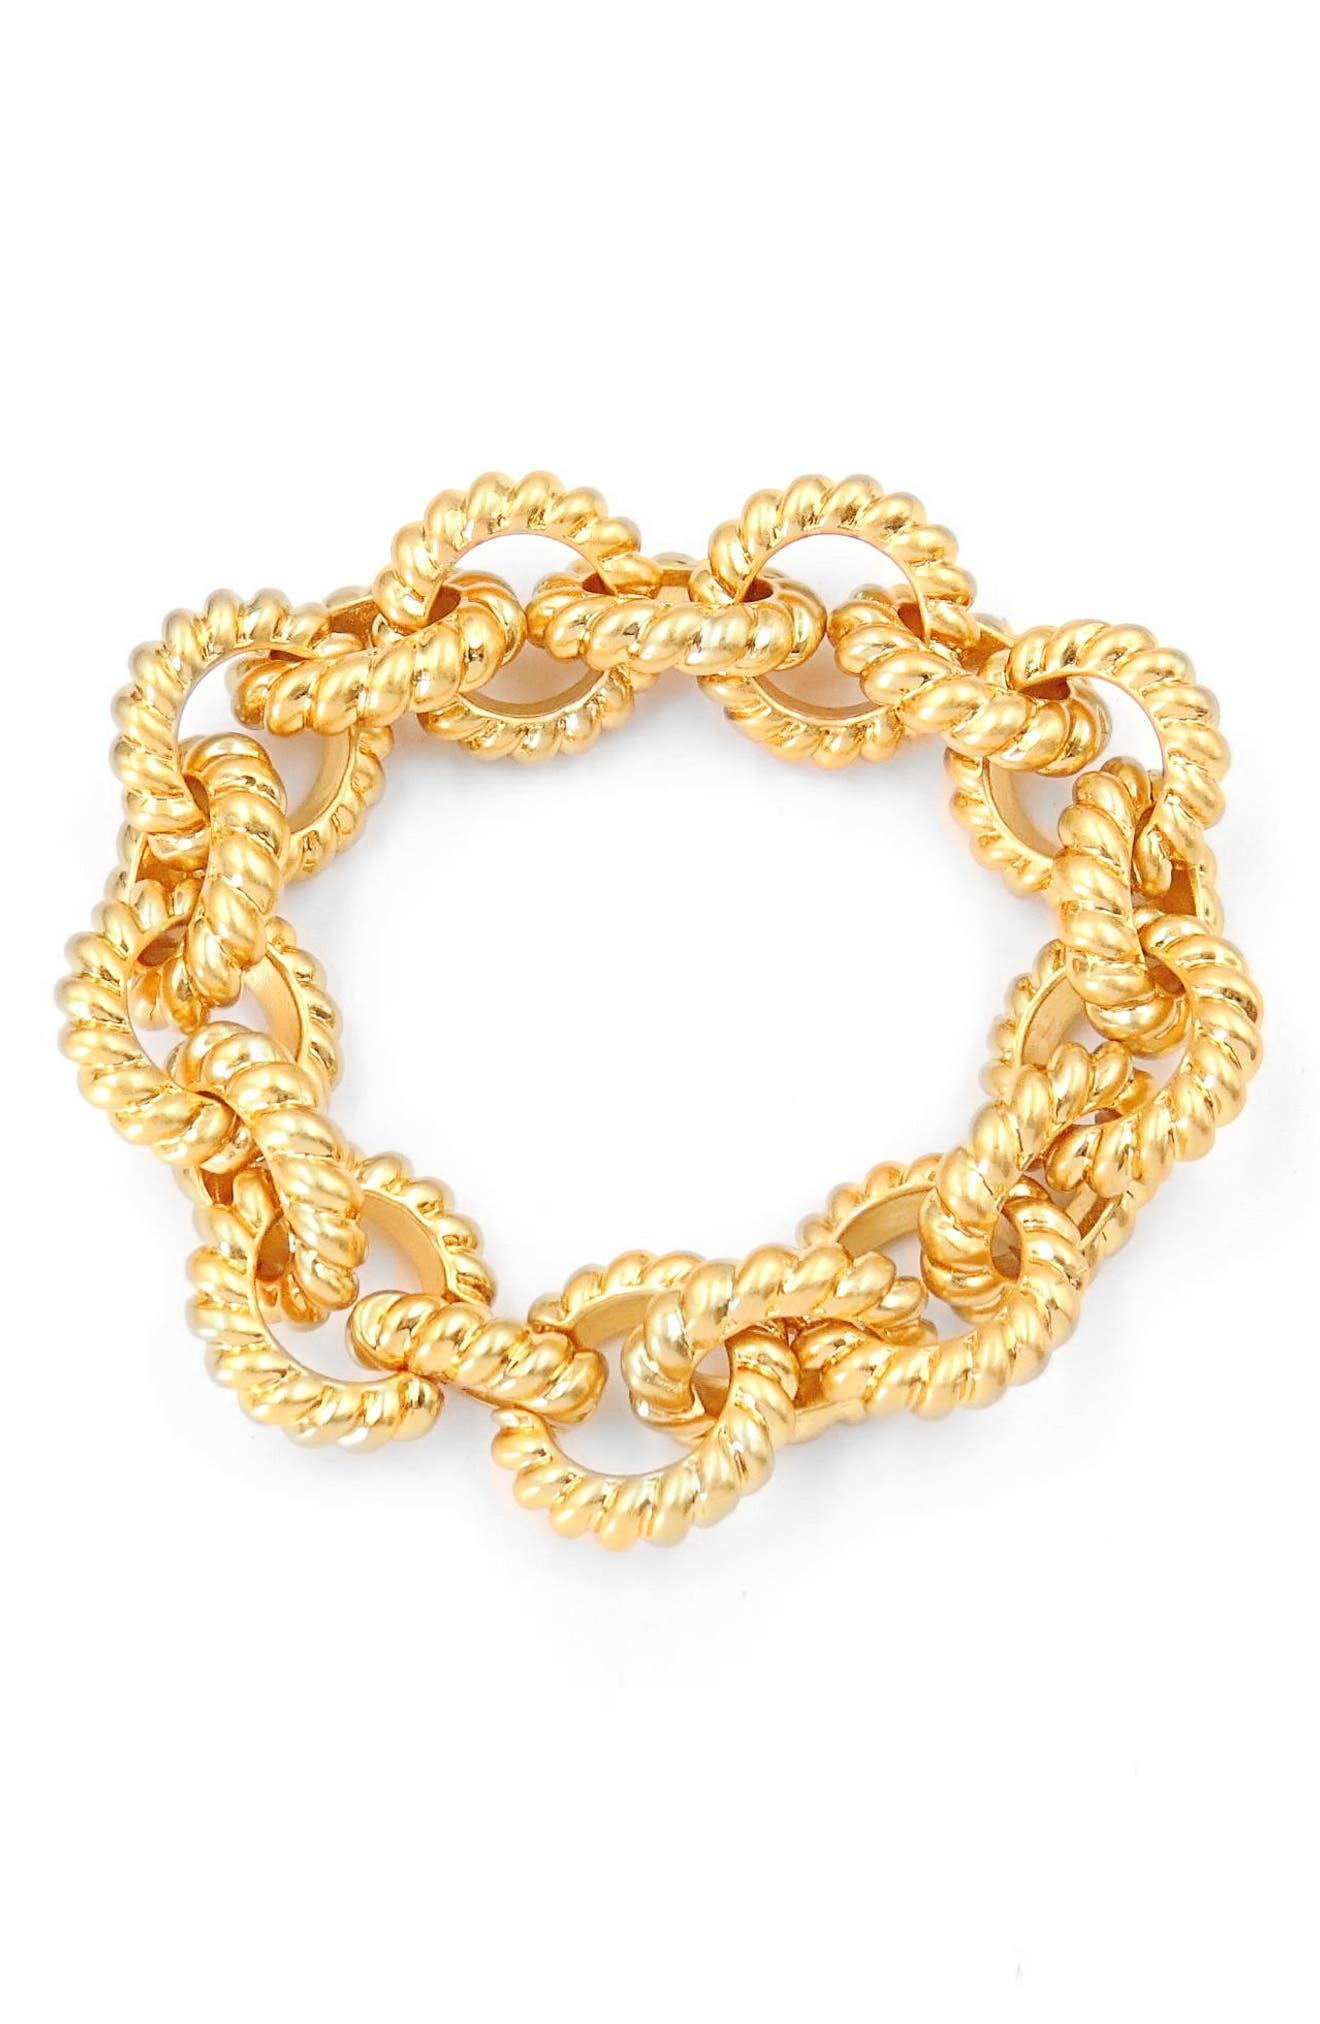 Asa Kaftans Circle Link Bracelet